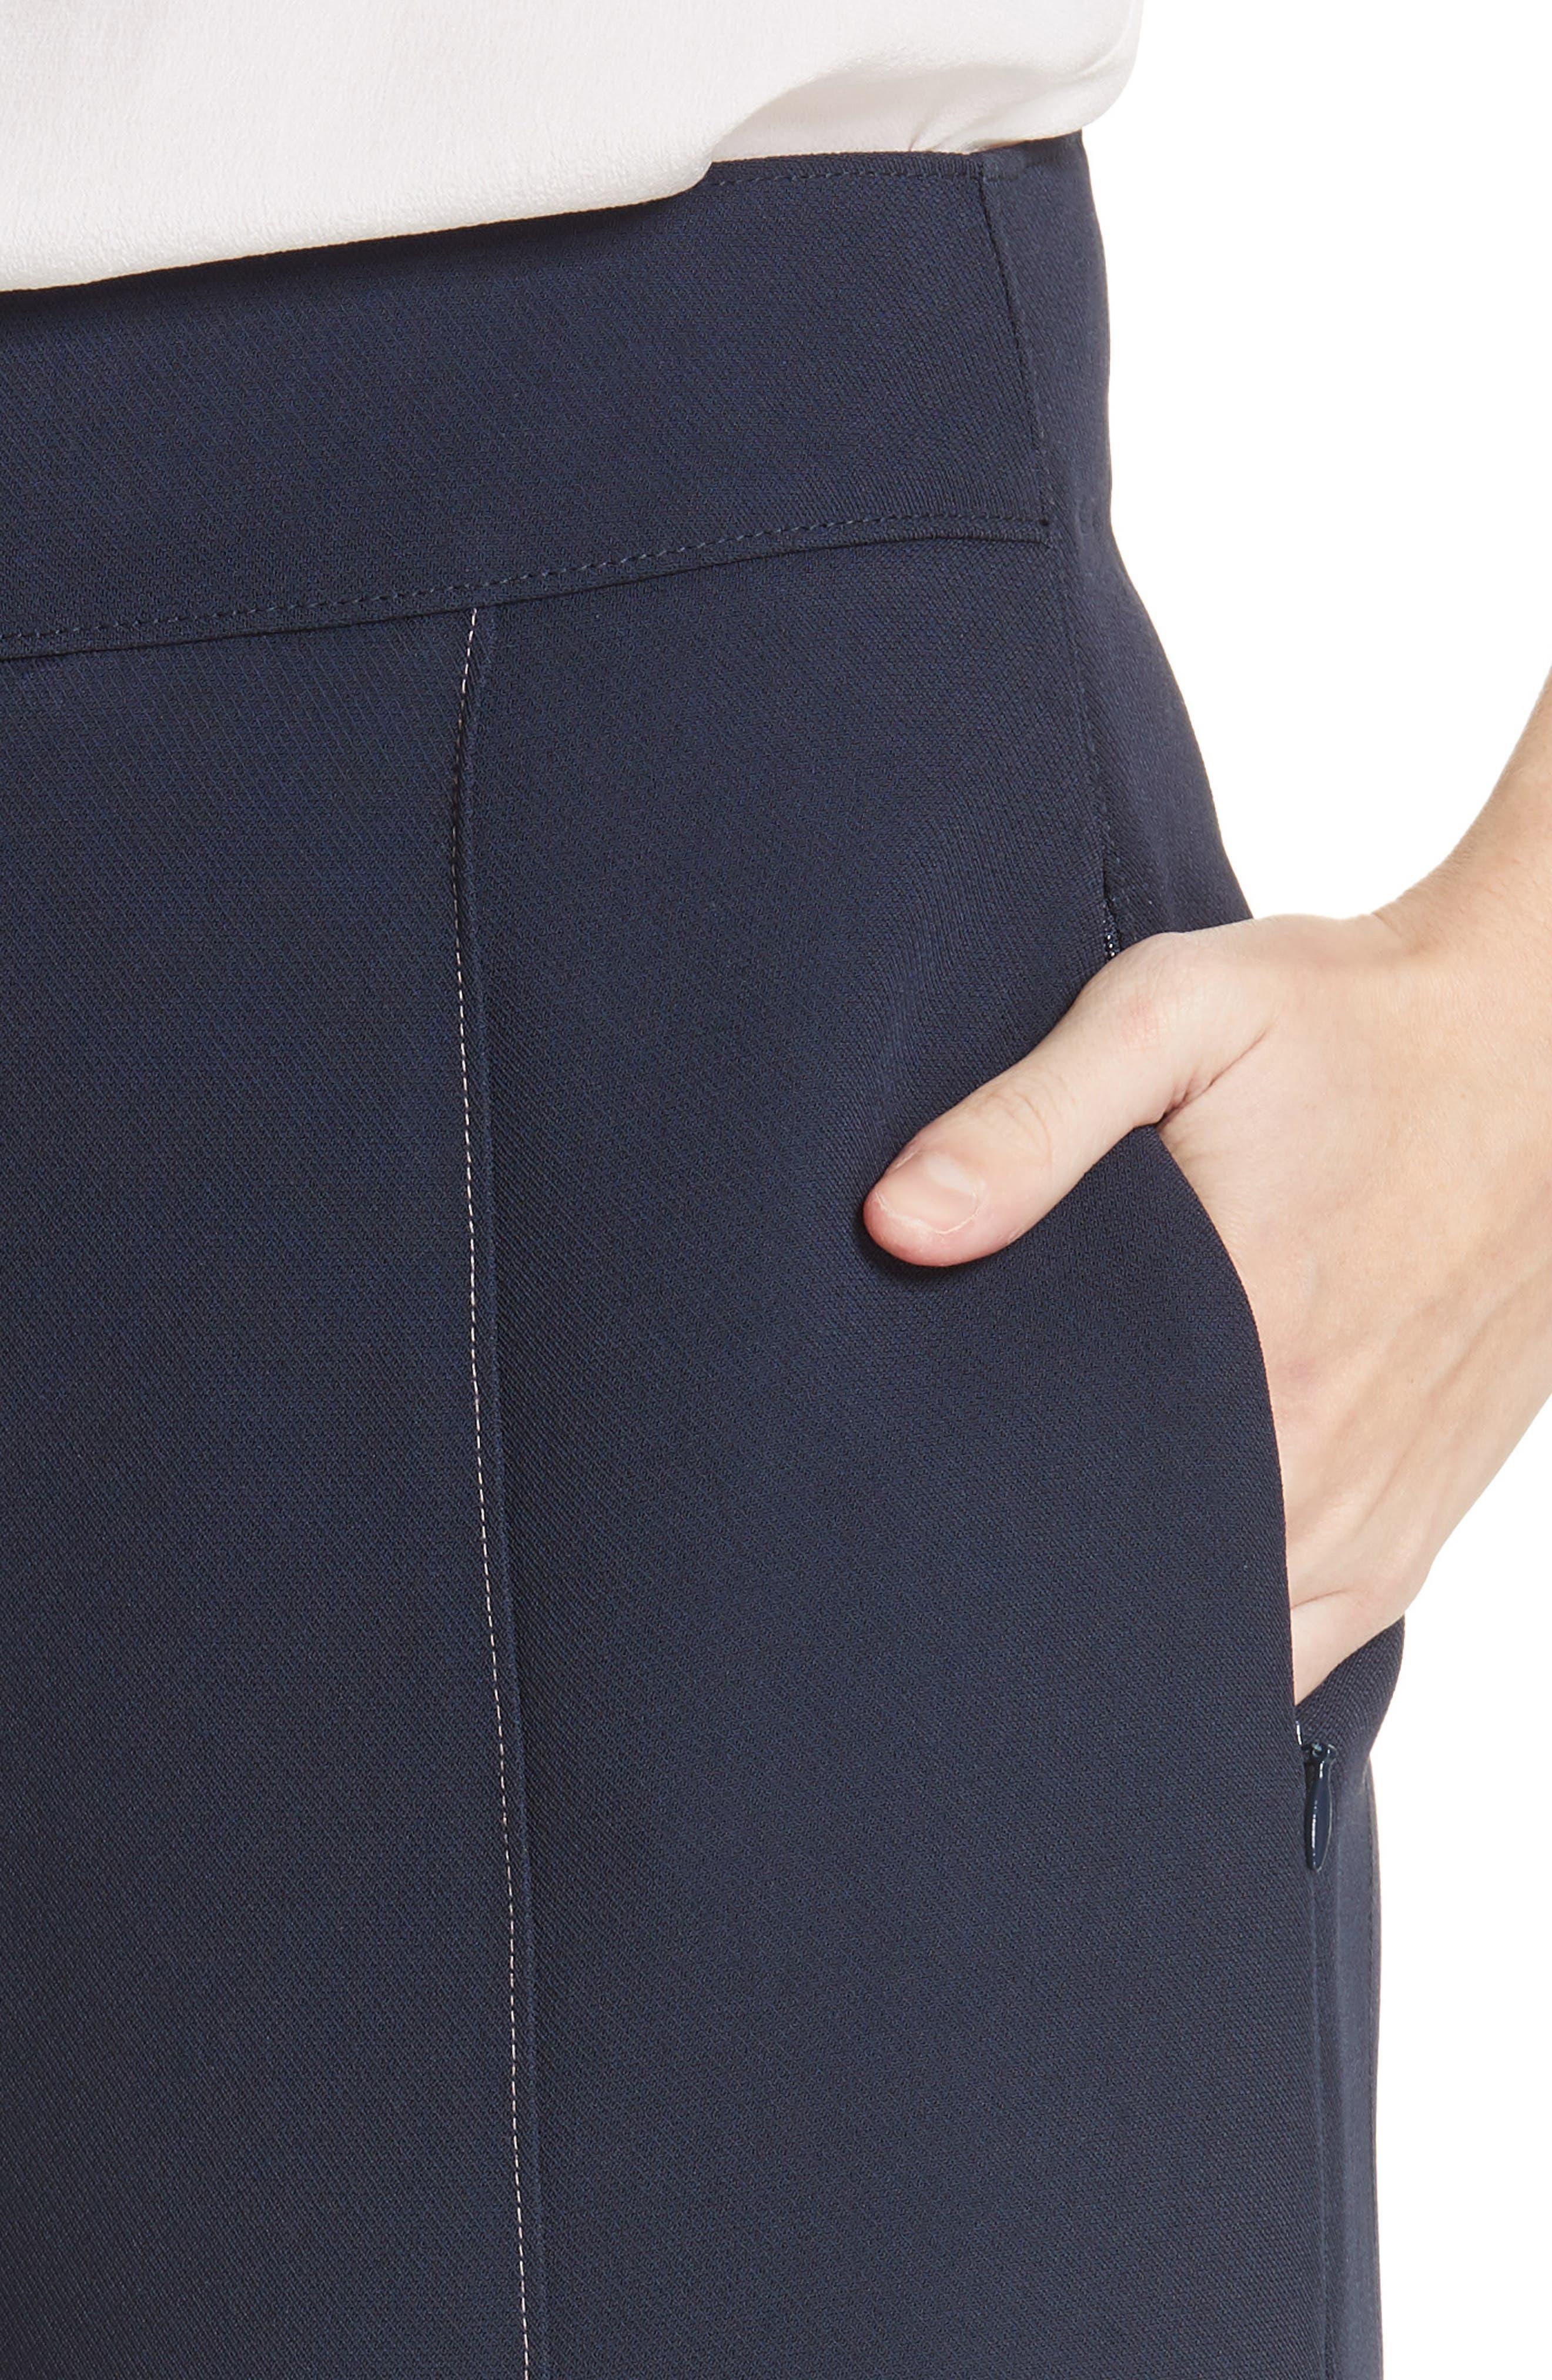 Lapari Pintuck Trousers,                             Alternate thumbnail 4, color,                             400